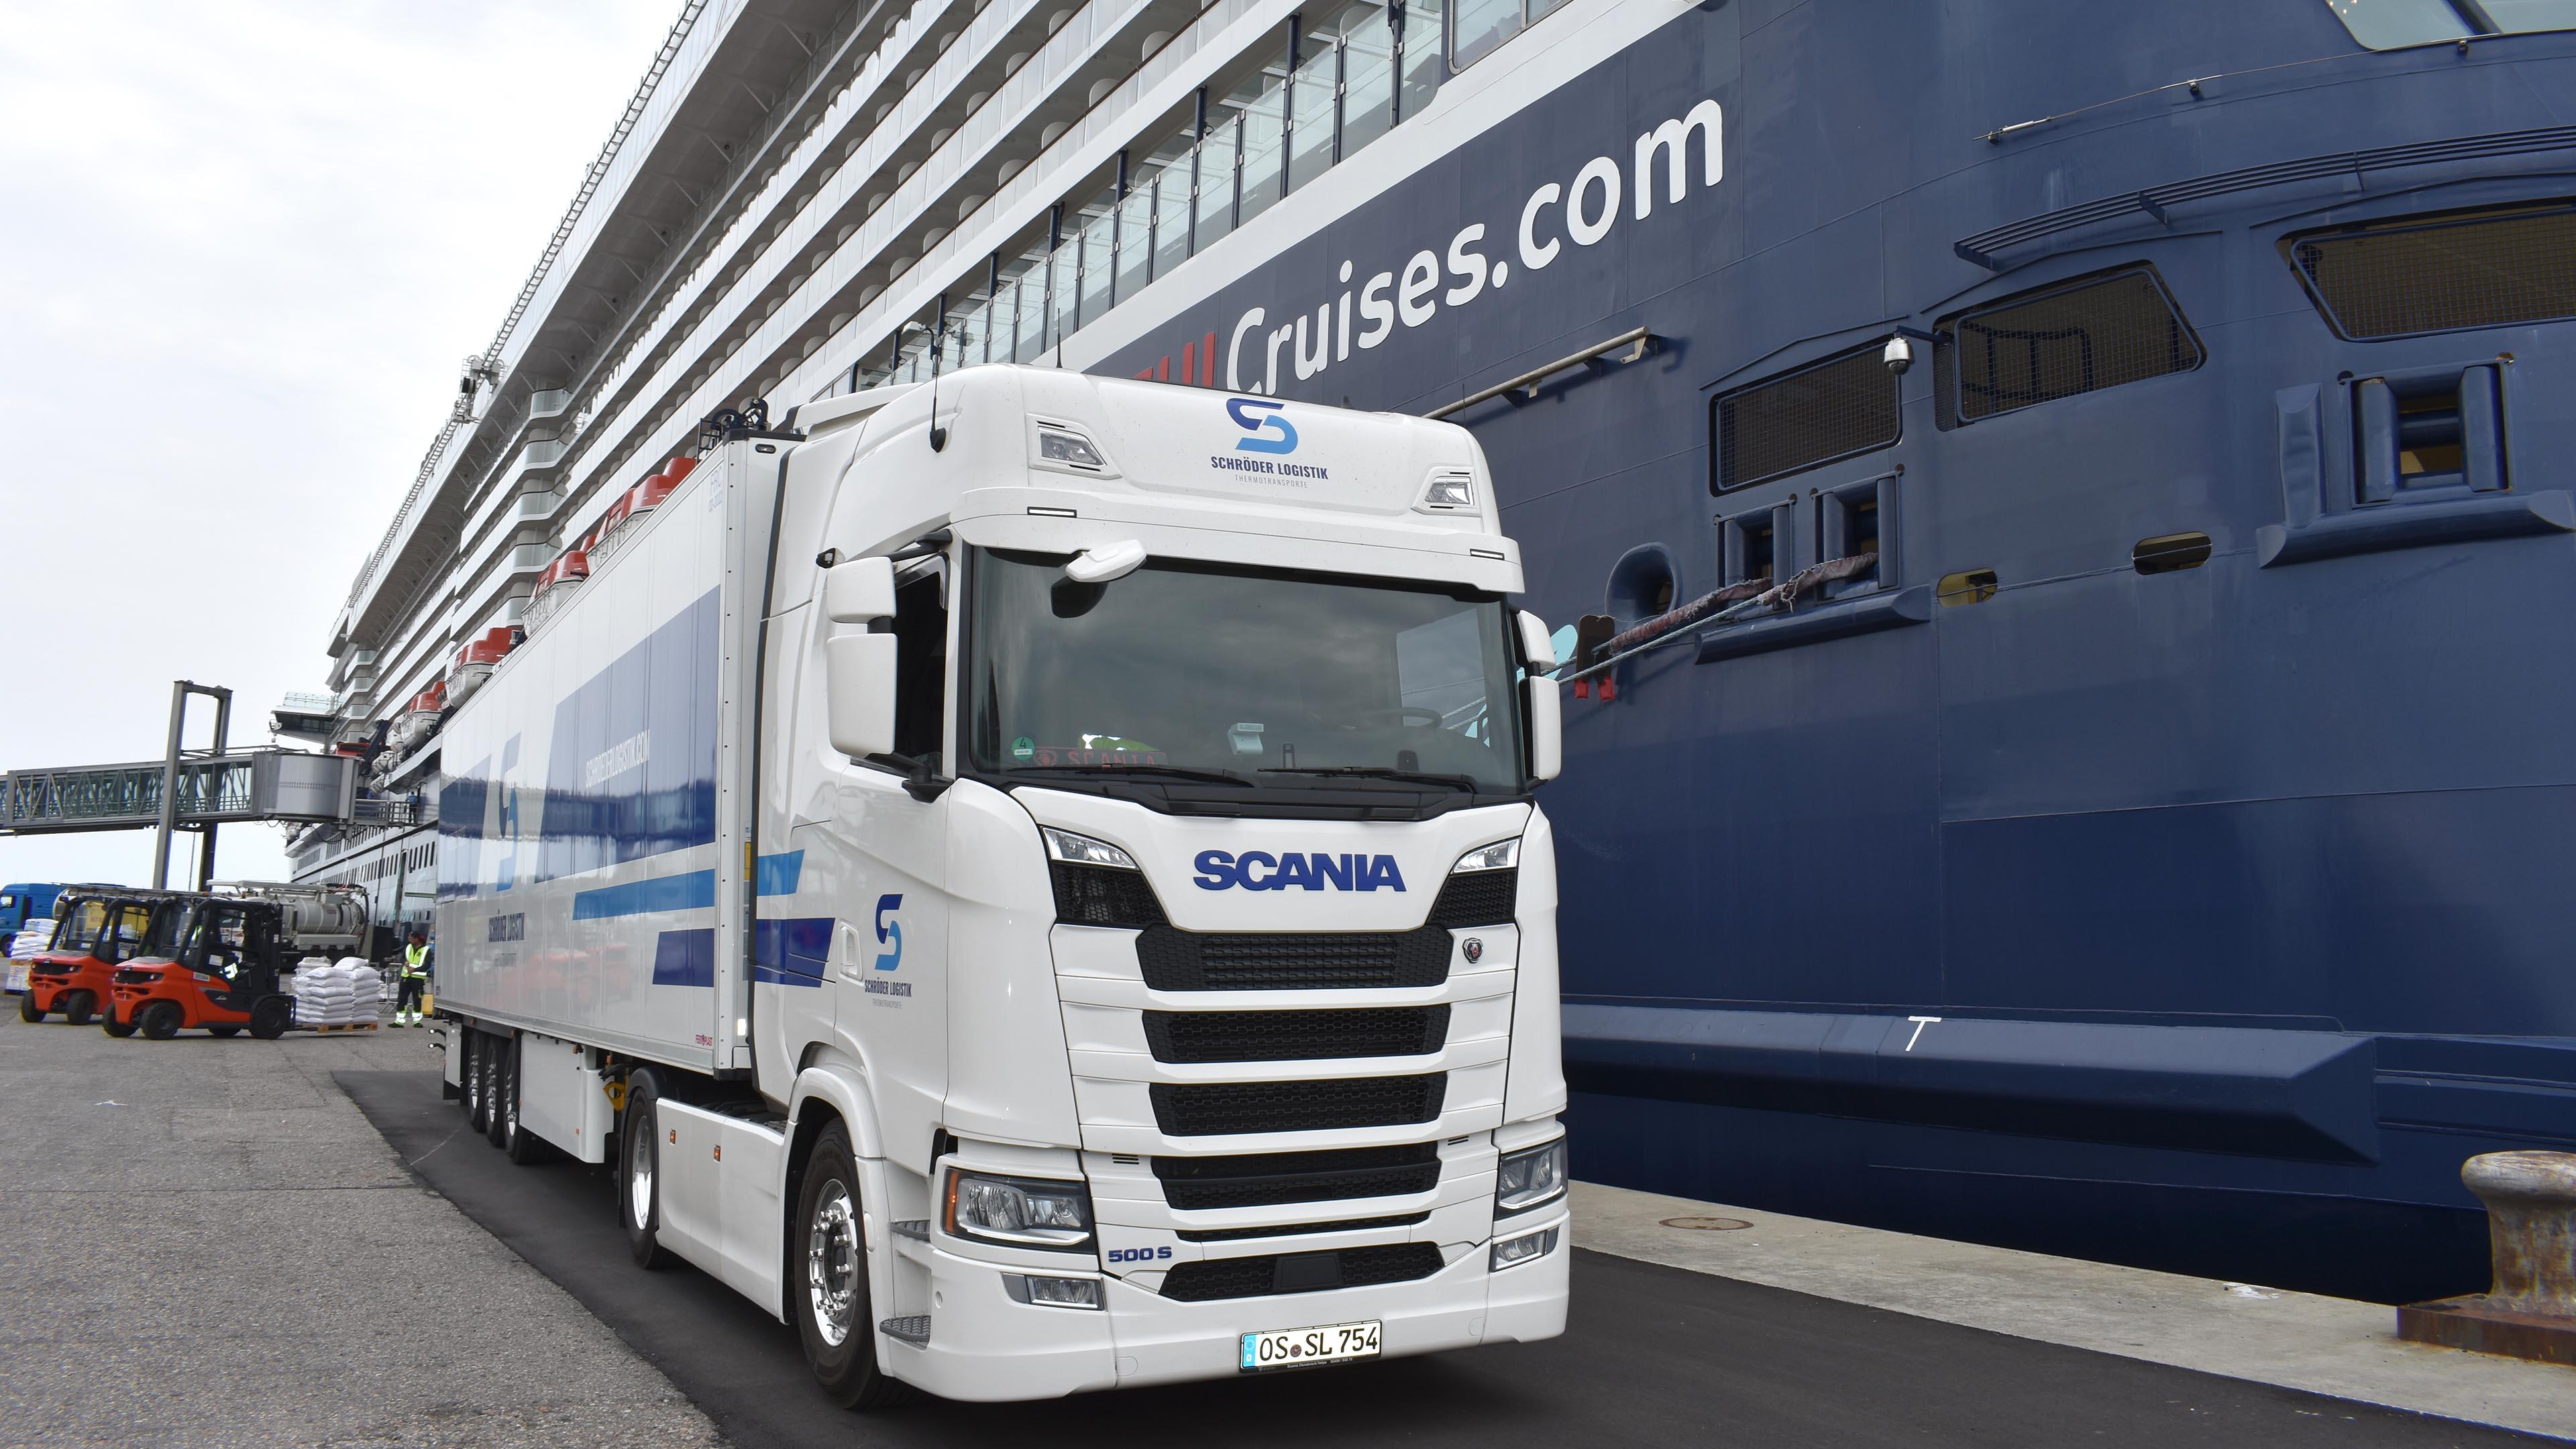 Schröder Logistik Kühltransport vor Kreuzfahrtschiff